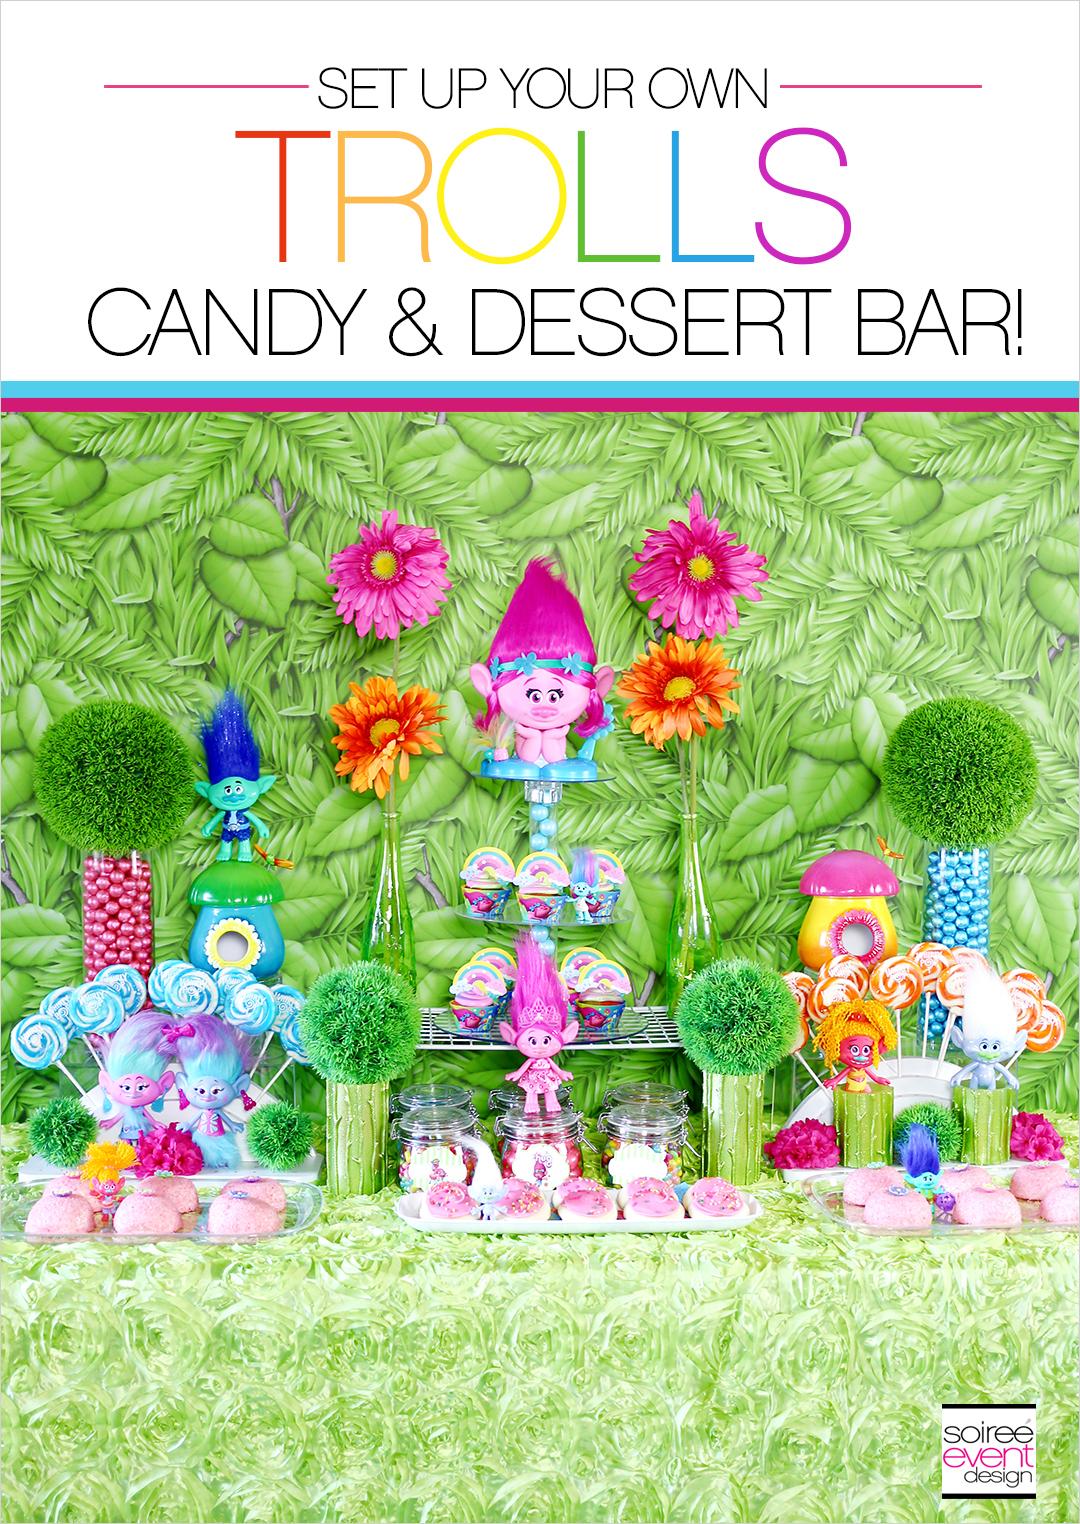 Trolls Party Ideas, Trolls Party Candy Buffet, Trolls Party Dessert Table